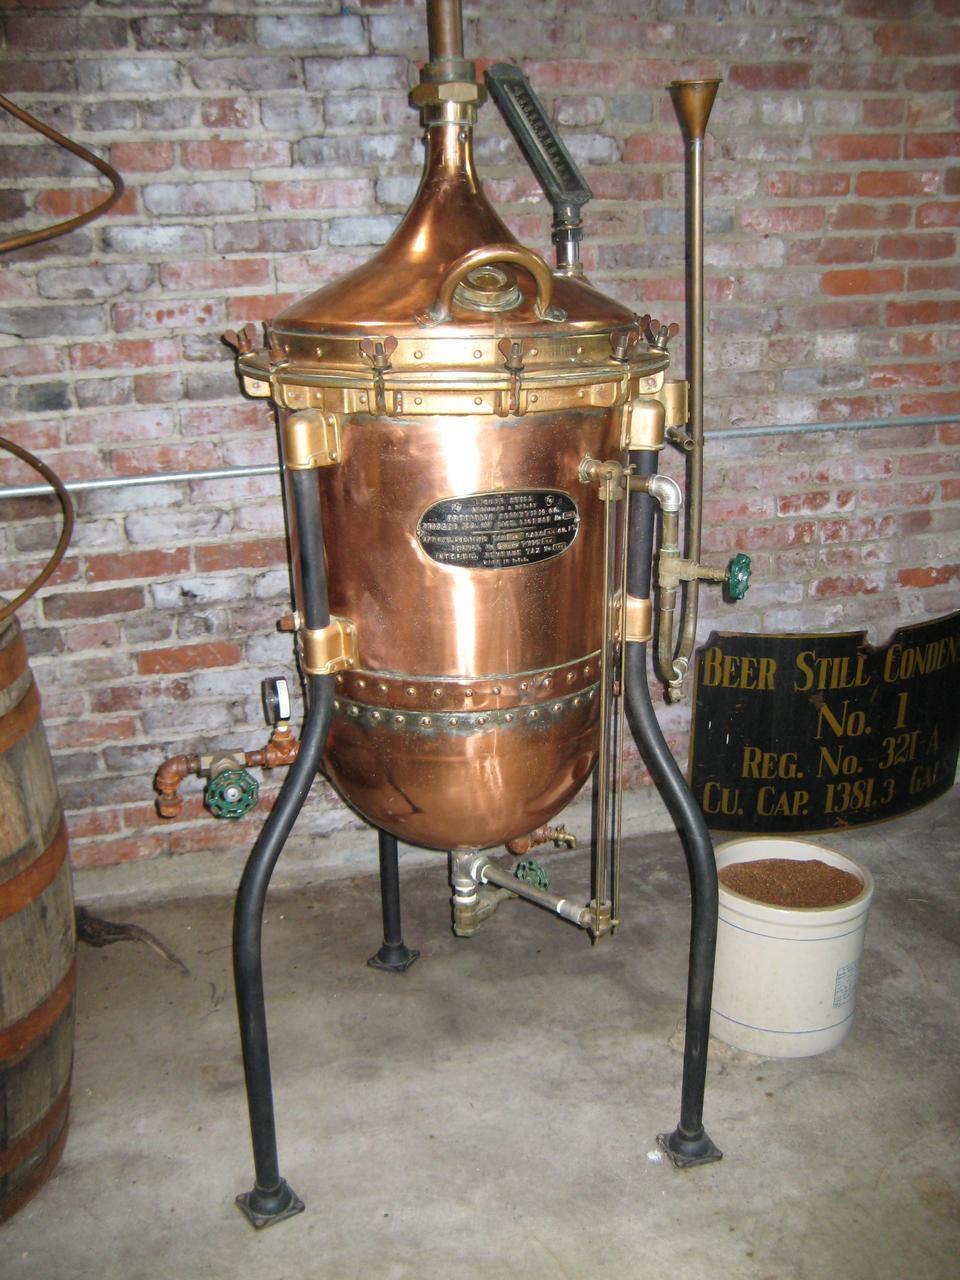 File:Liquor Still Frankfort 489226997.jpg - Wikimedia Commons